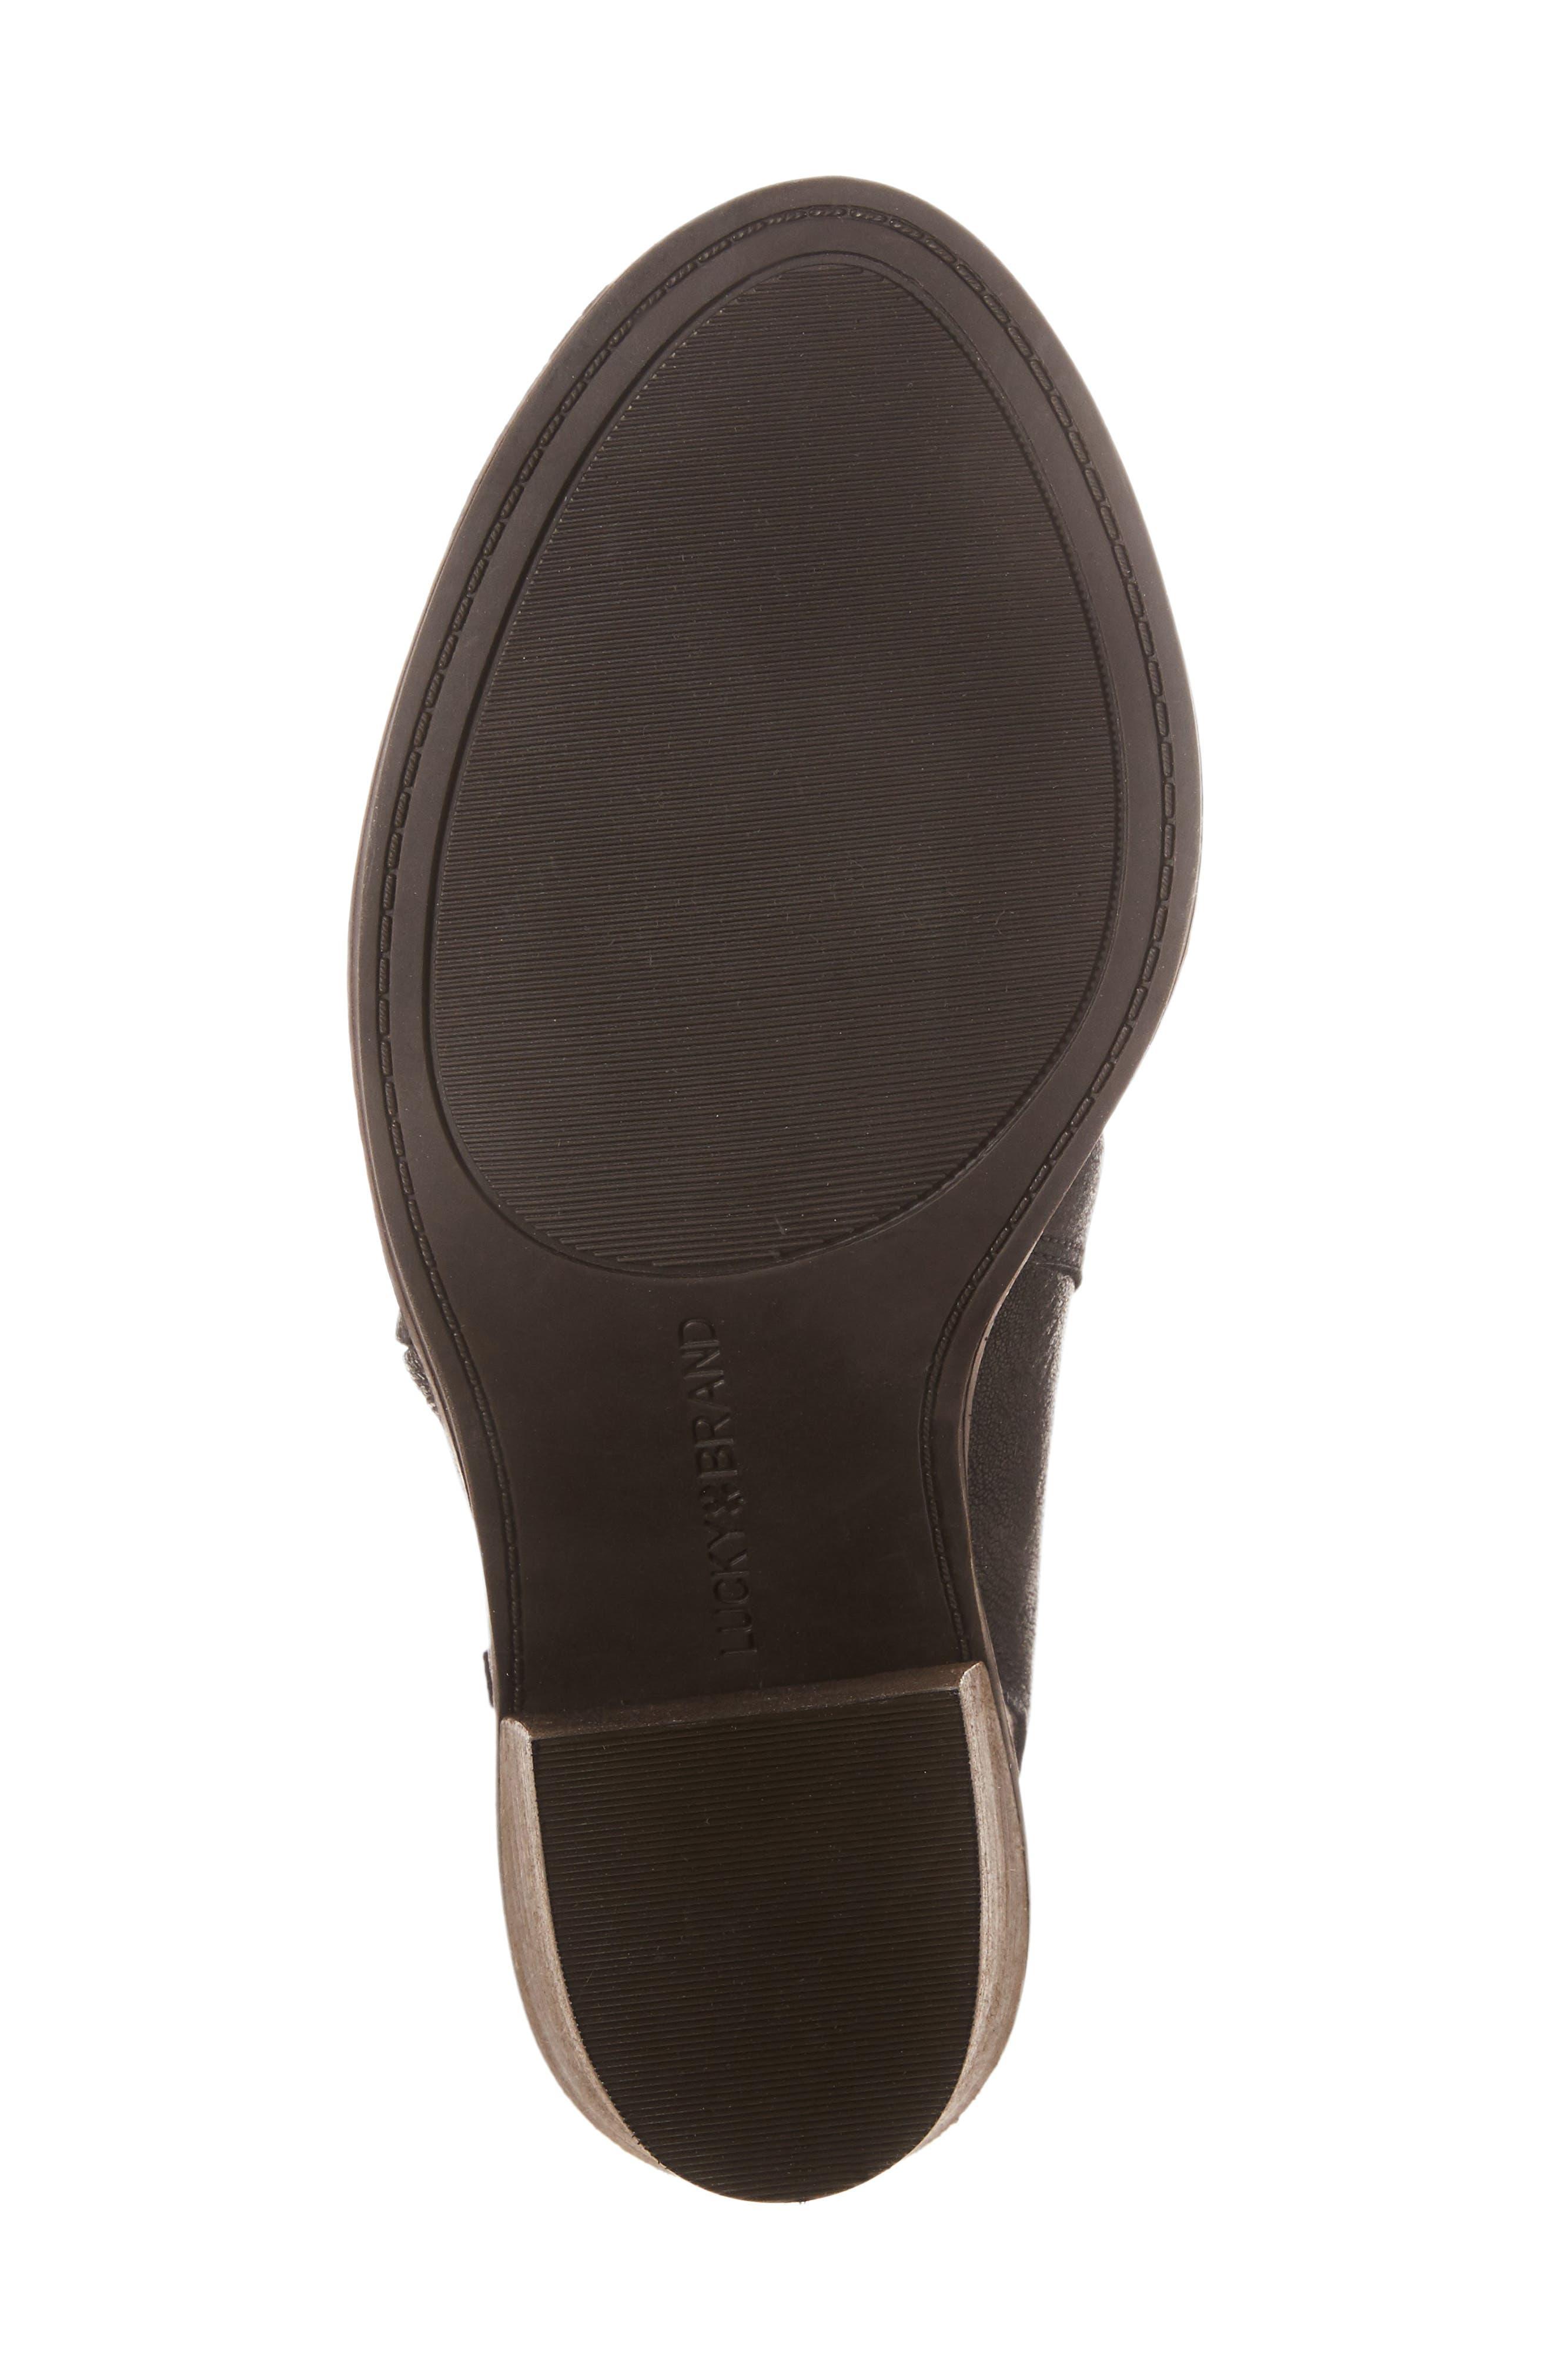 Terrie Peep Toe Bootie,                             Alternate thumbnail 4, color,                             Black Leather